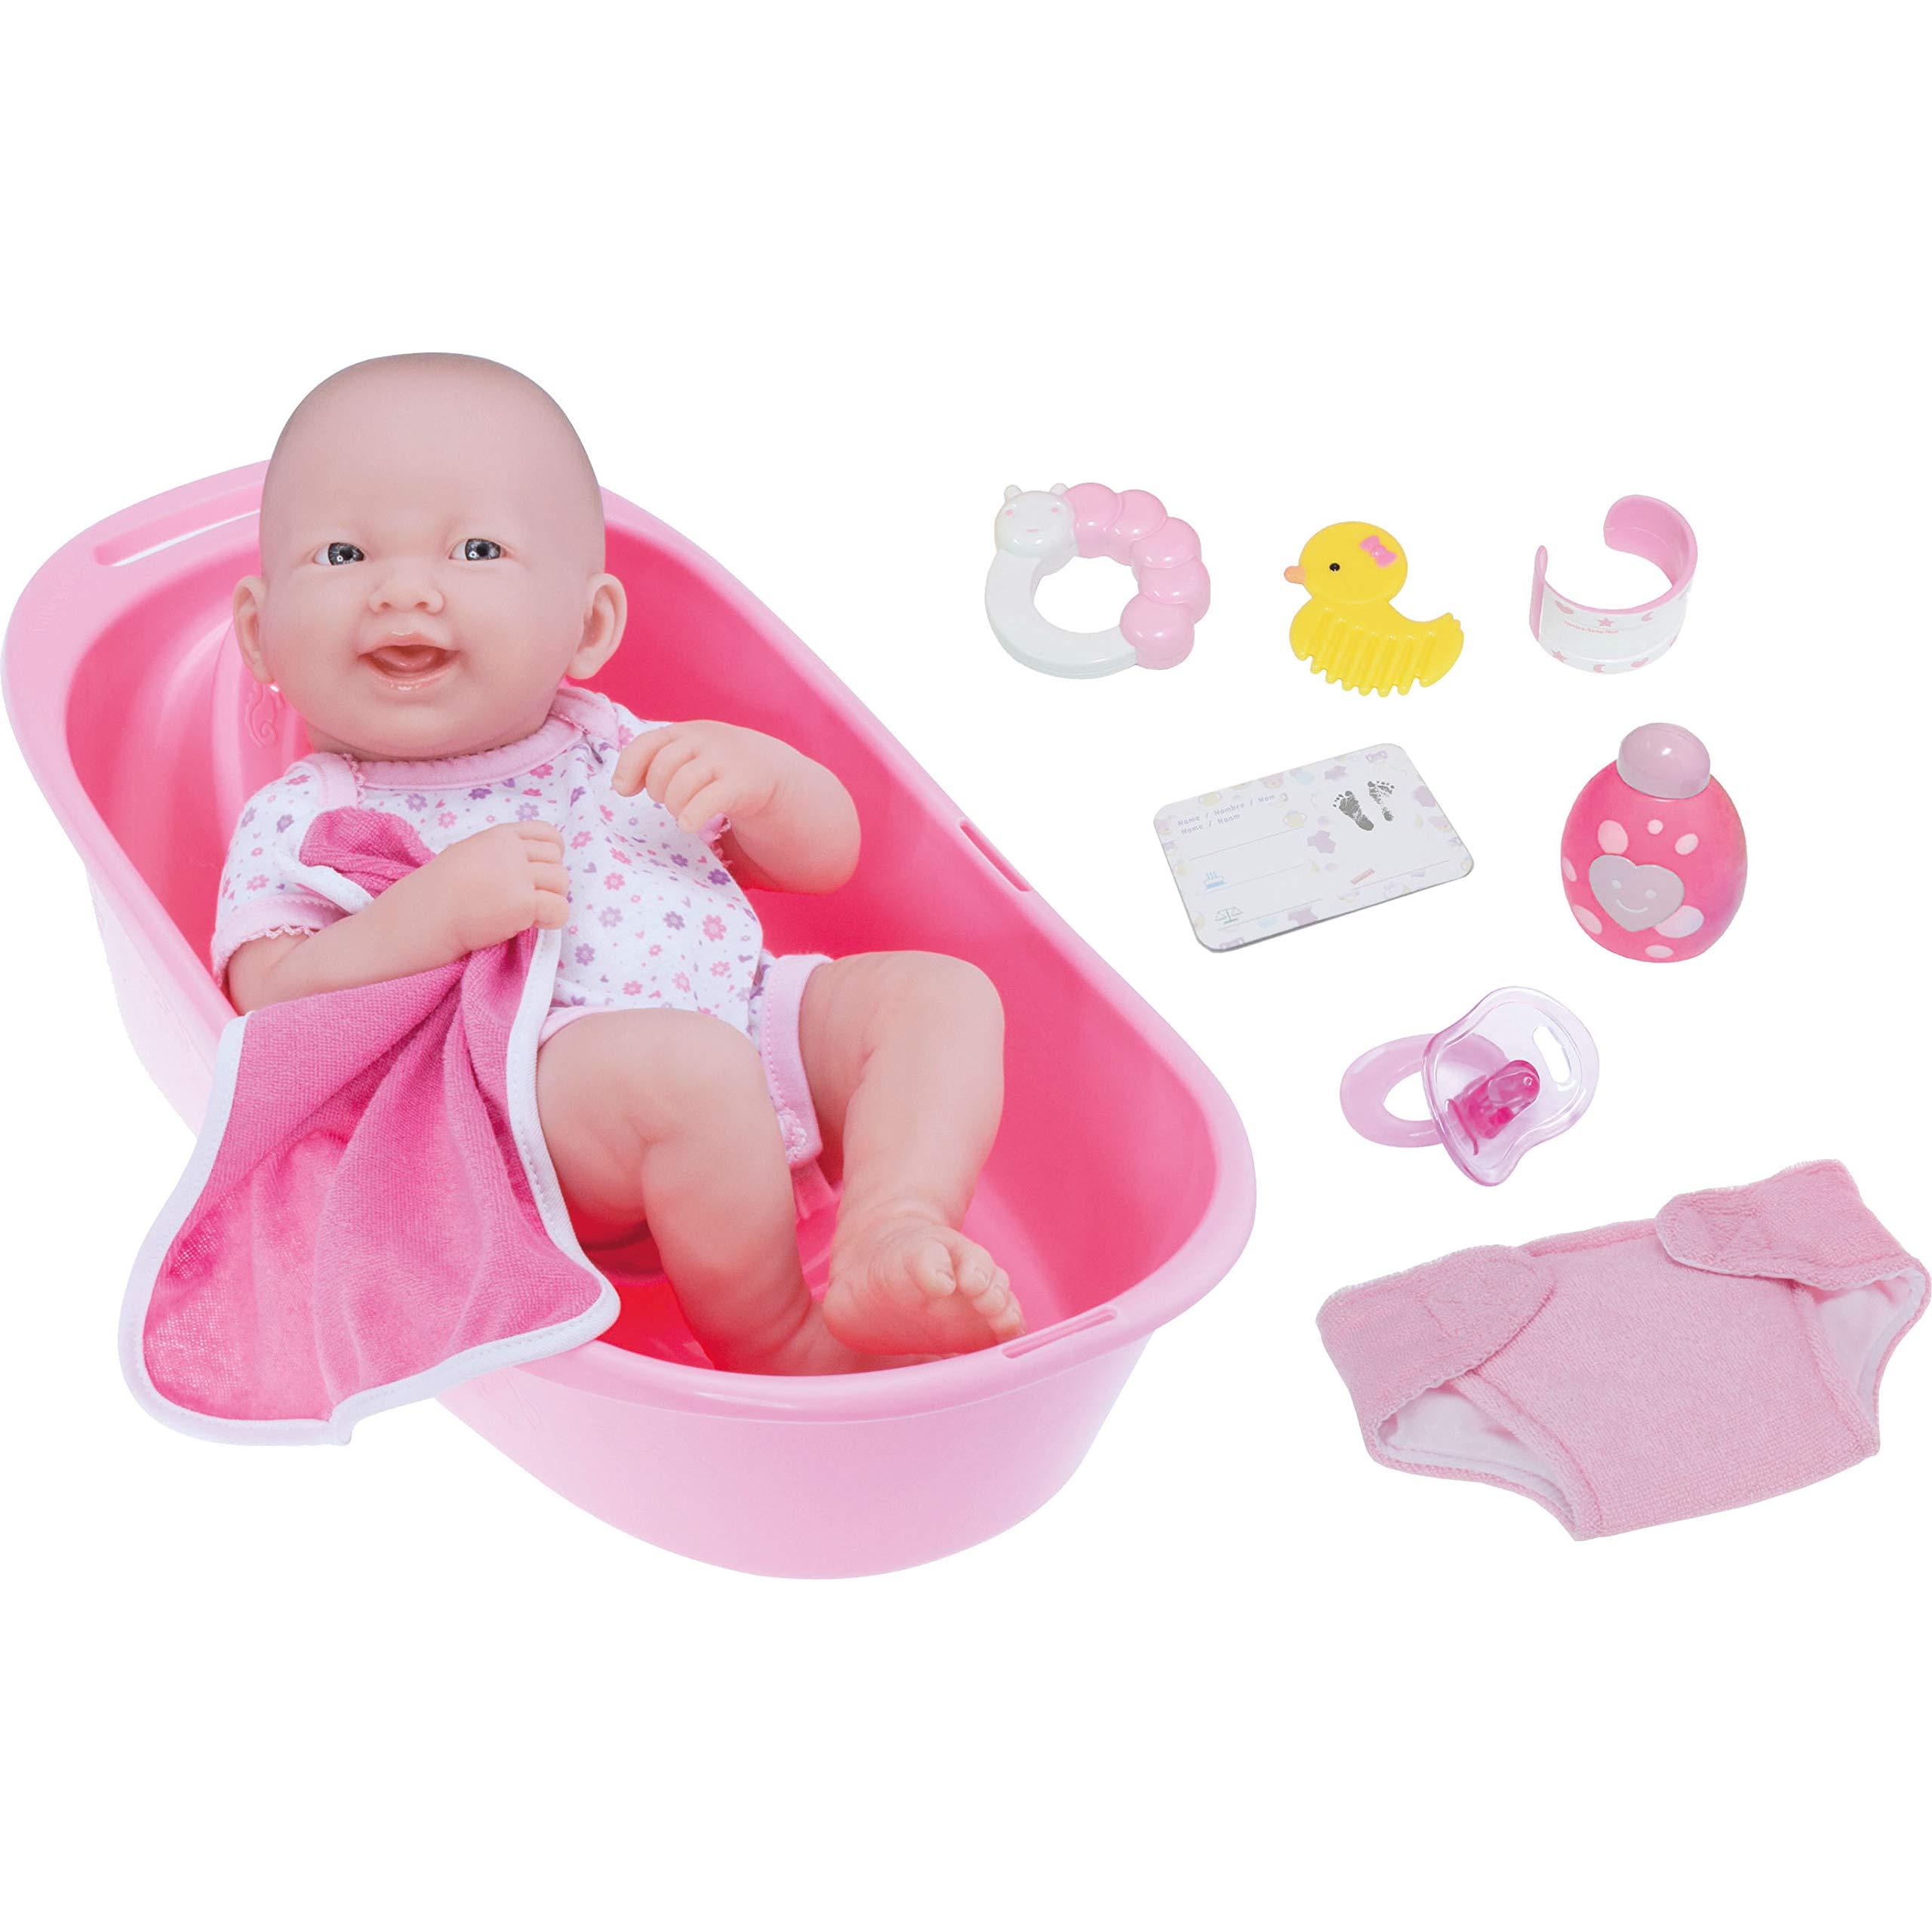 "LA NEWBORN 8 Piece Deluxe BATHTUB GIFT SET, featuring 14"" Life-Like All Vinyl Smiling Baby Newborn Doll, Pink"